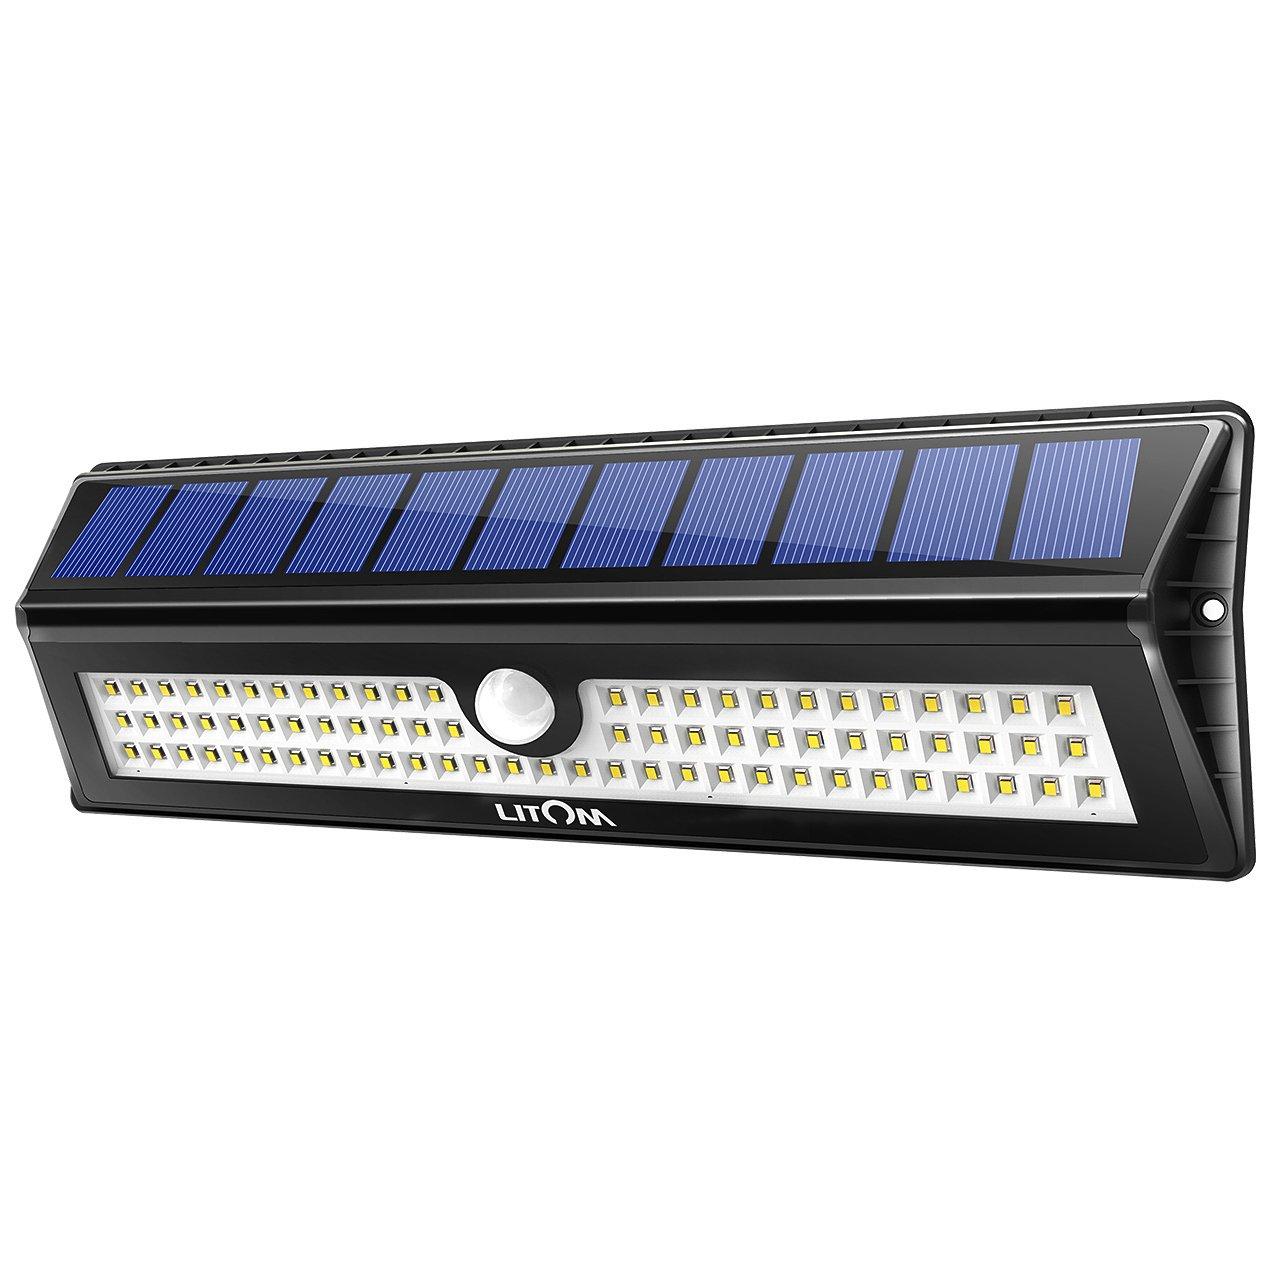 Litom 77 LED Super Bright Solar Lights Outdoor, Solar Motion Sensor Security Light Wireless IP65 Waterproof Wall Lights for Front Door, Back Yard, Garage, Deck, Porch, Shed, Walkway, Step(1 Pack)